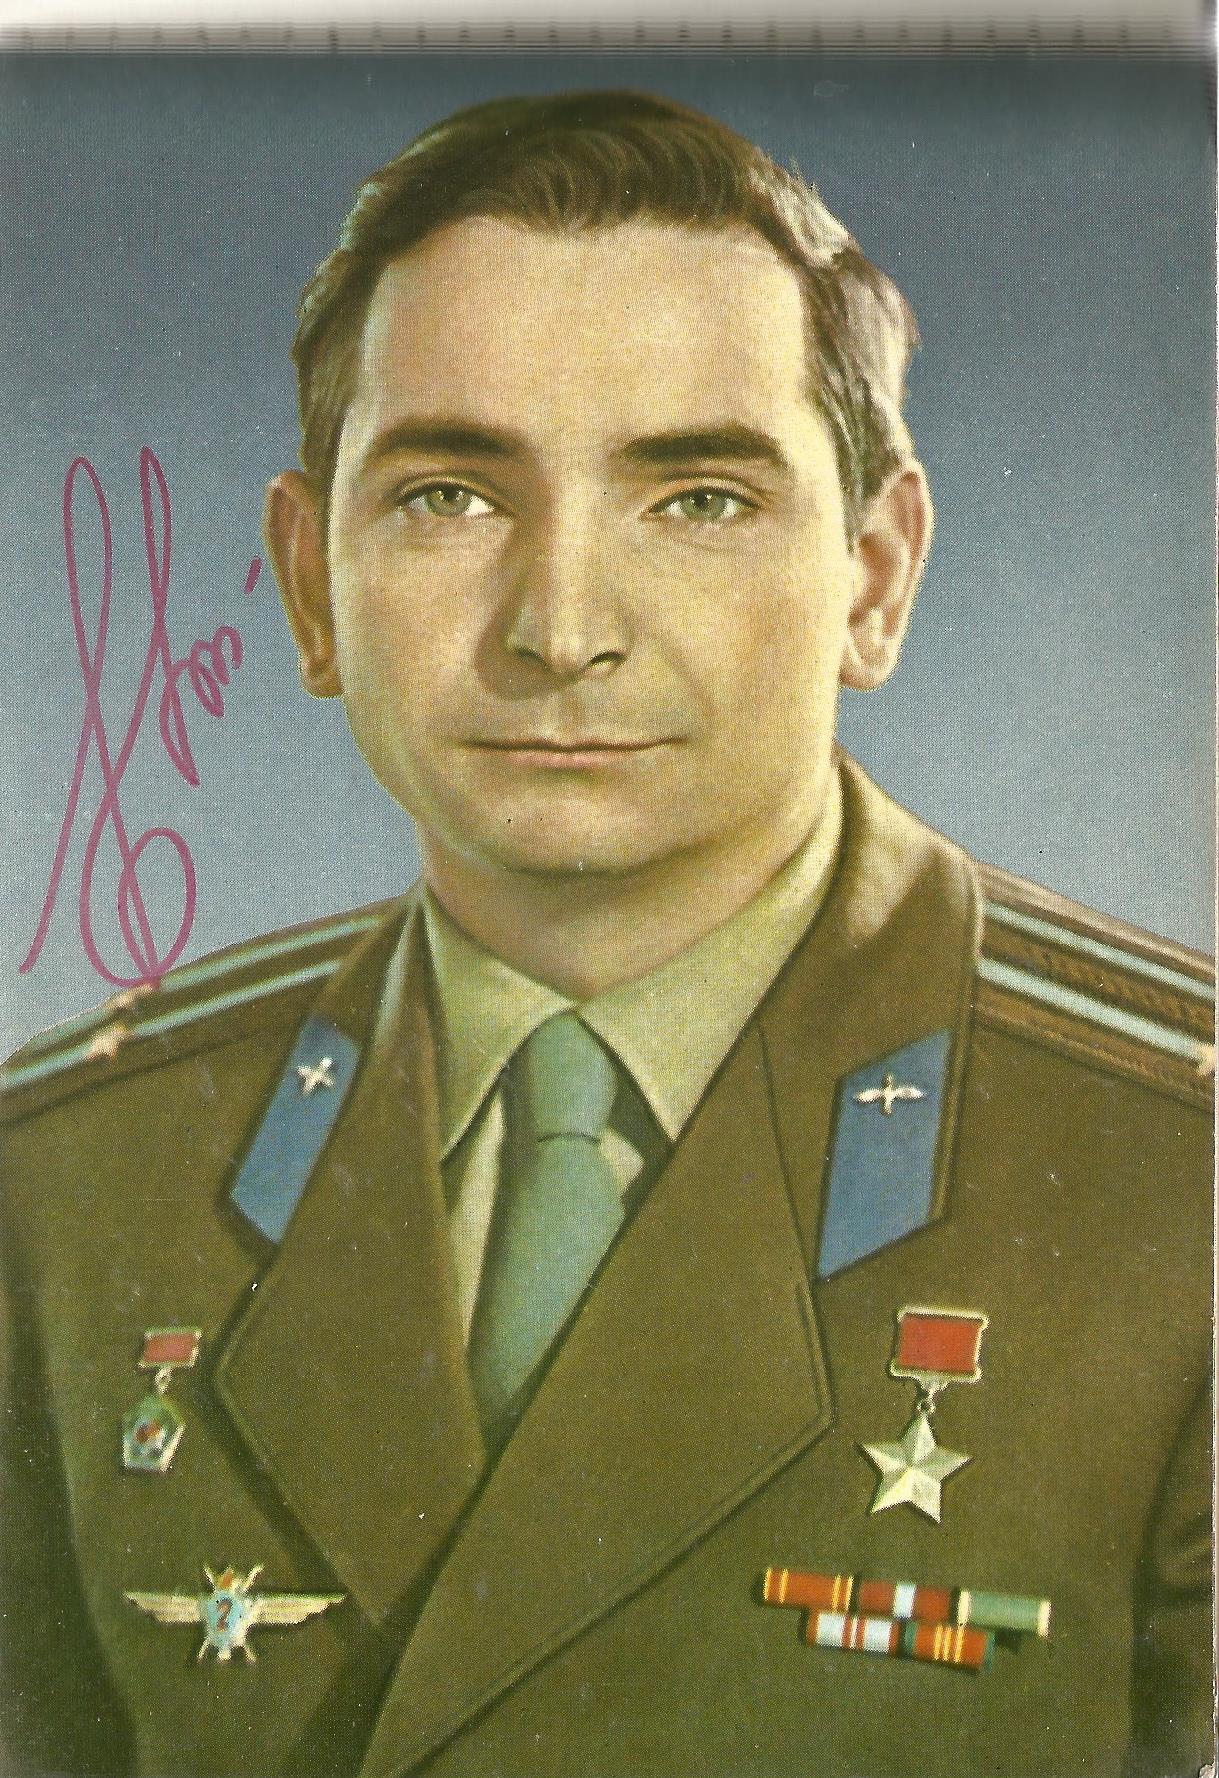 Valery Bykovsky signed Vintage Russian Cosmonauts picture postcard book. Bykovsky was a Soviet - Image 2 of 3